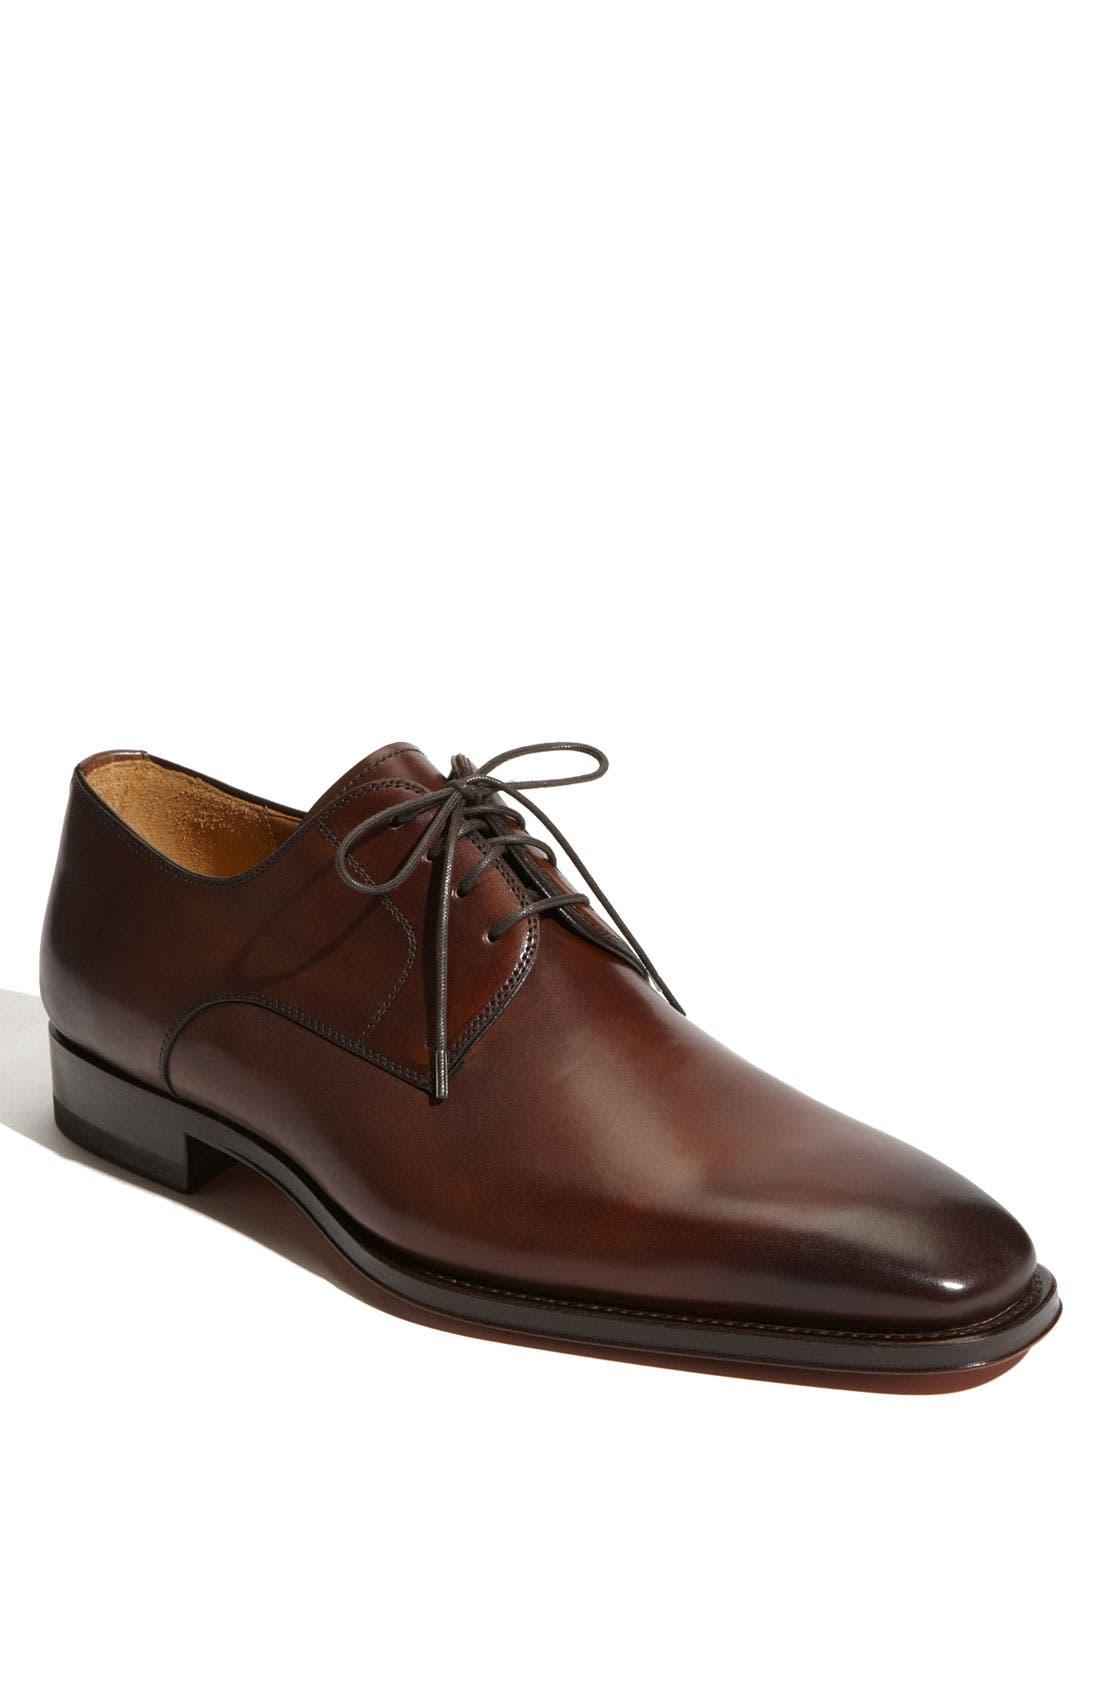 Alternate Image 1 Selected - Magnanni 'Colo' Plain Toe Derby (Men)